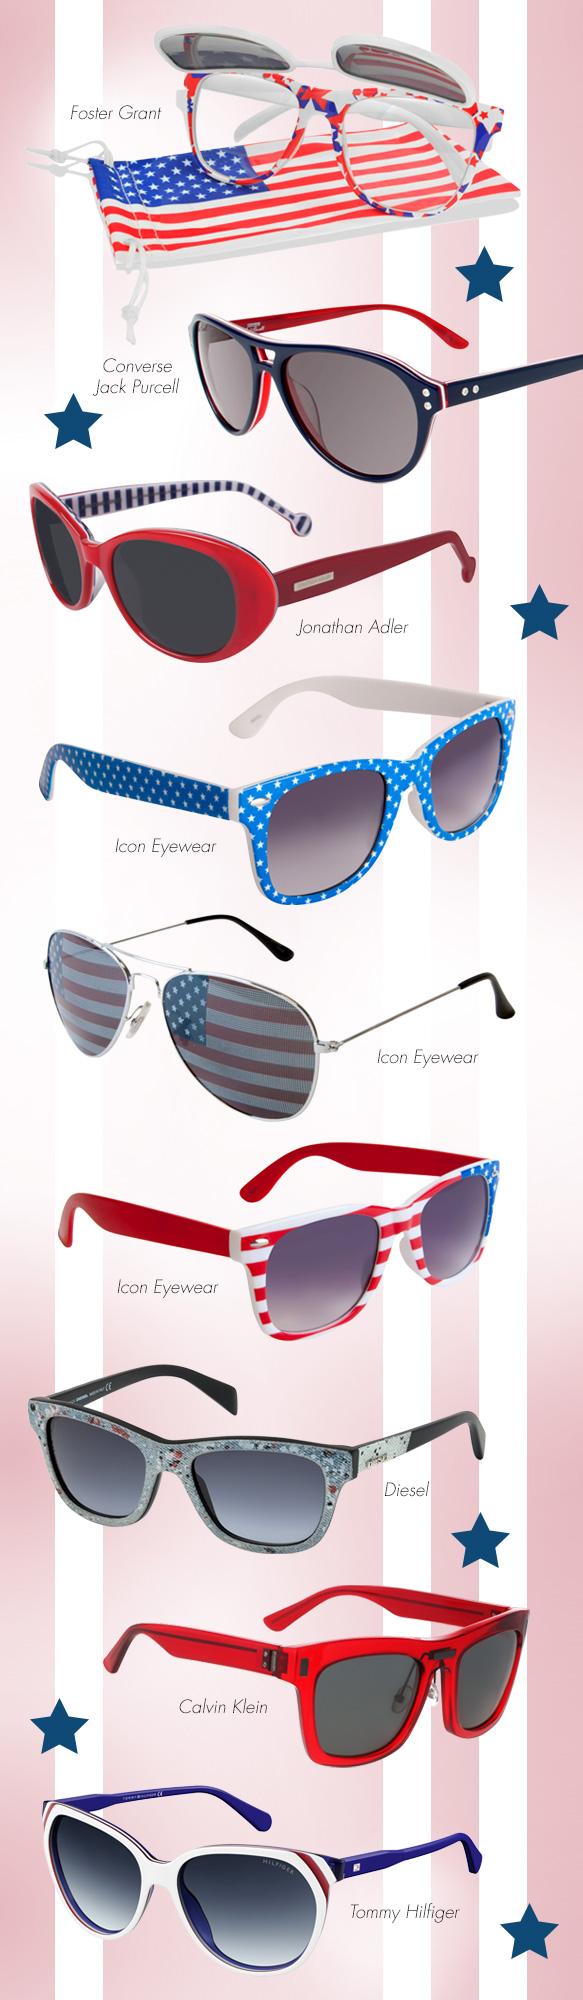 Foster Grant (Surge), Converse Jack Purcell (Y006), Jonathan Adler (Palm Beach), Icon Eyewear (20131-304001), Icon Eyewear (20131-305301), Icon Eyewear (30037-190580), Diesel (DL0111), Calvin Klein (CK7993S), Tommy Hilfiger (TH 1315/S)